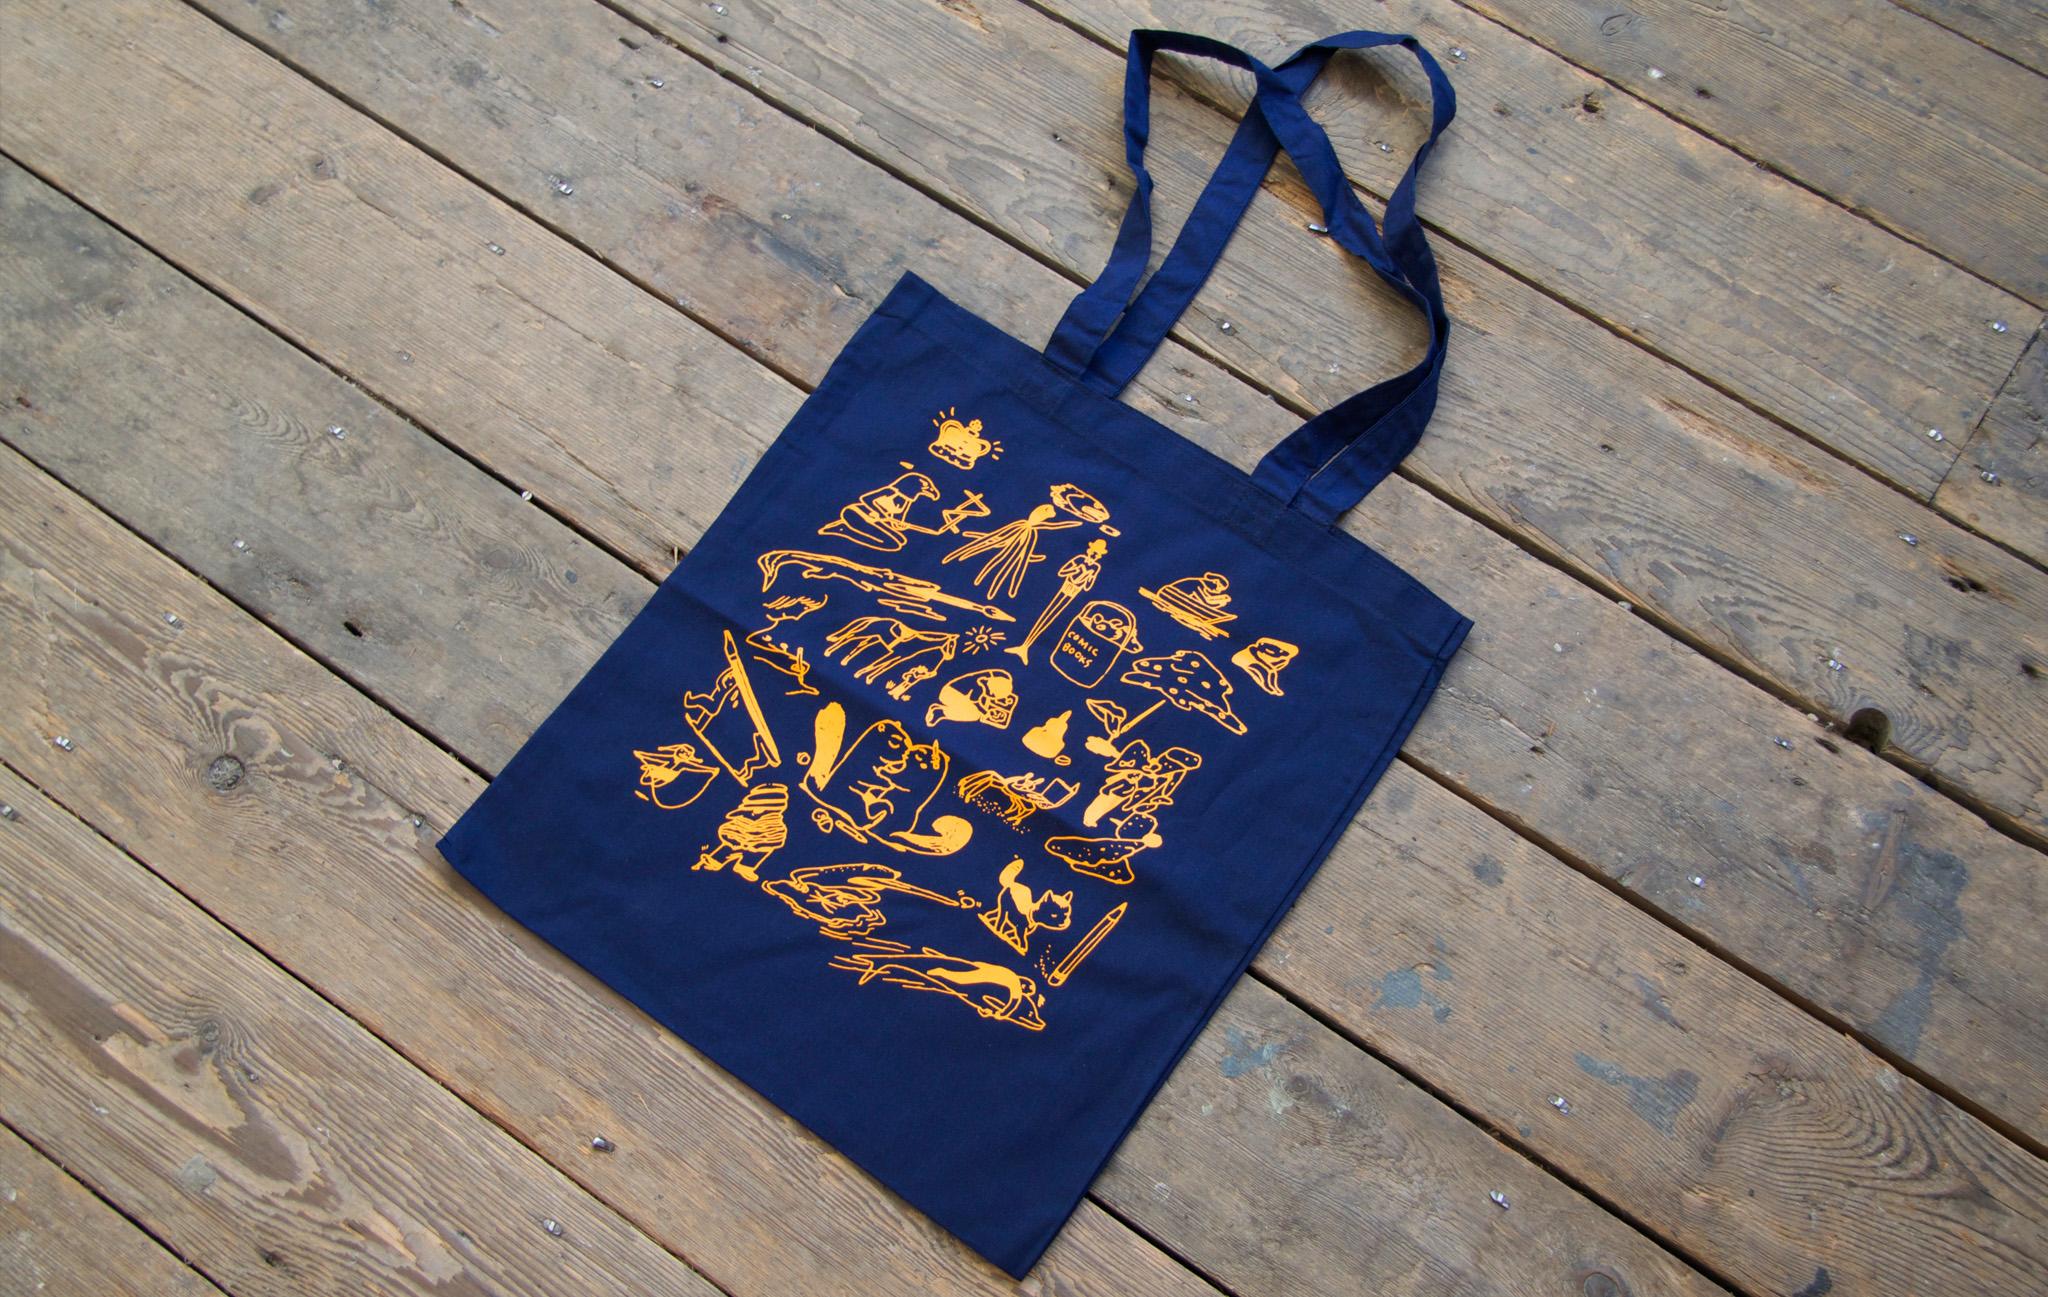 Limited Edition Jillian Tamaki ELCAF Tote Bag